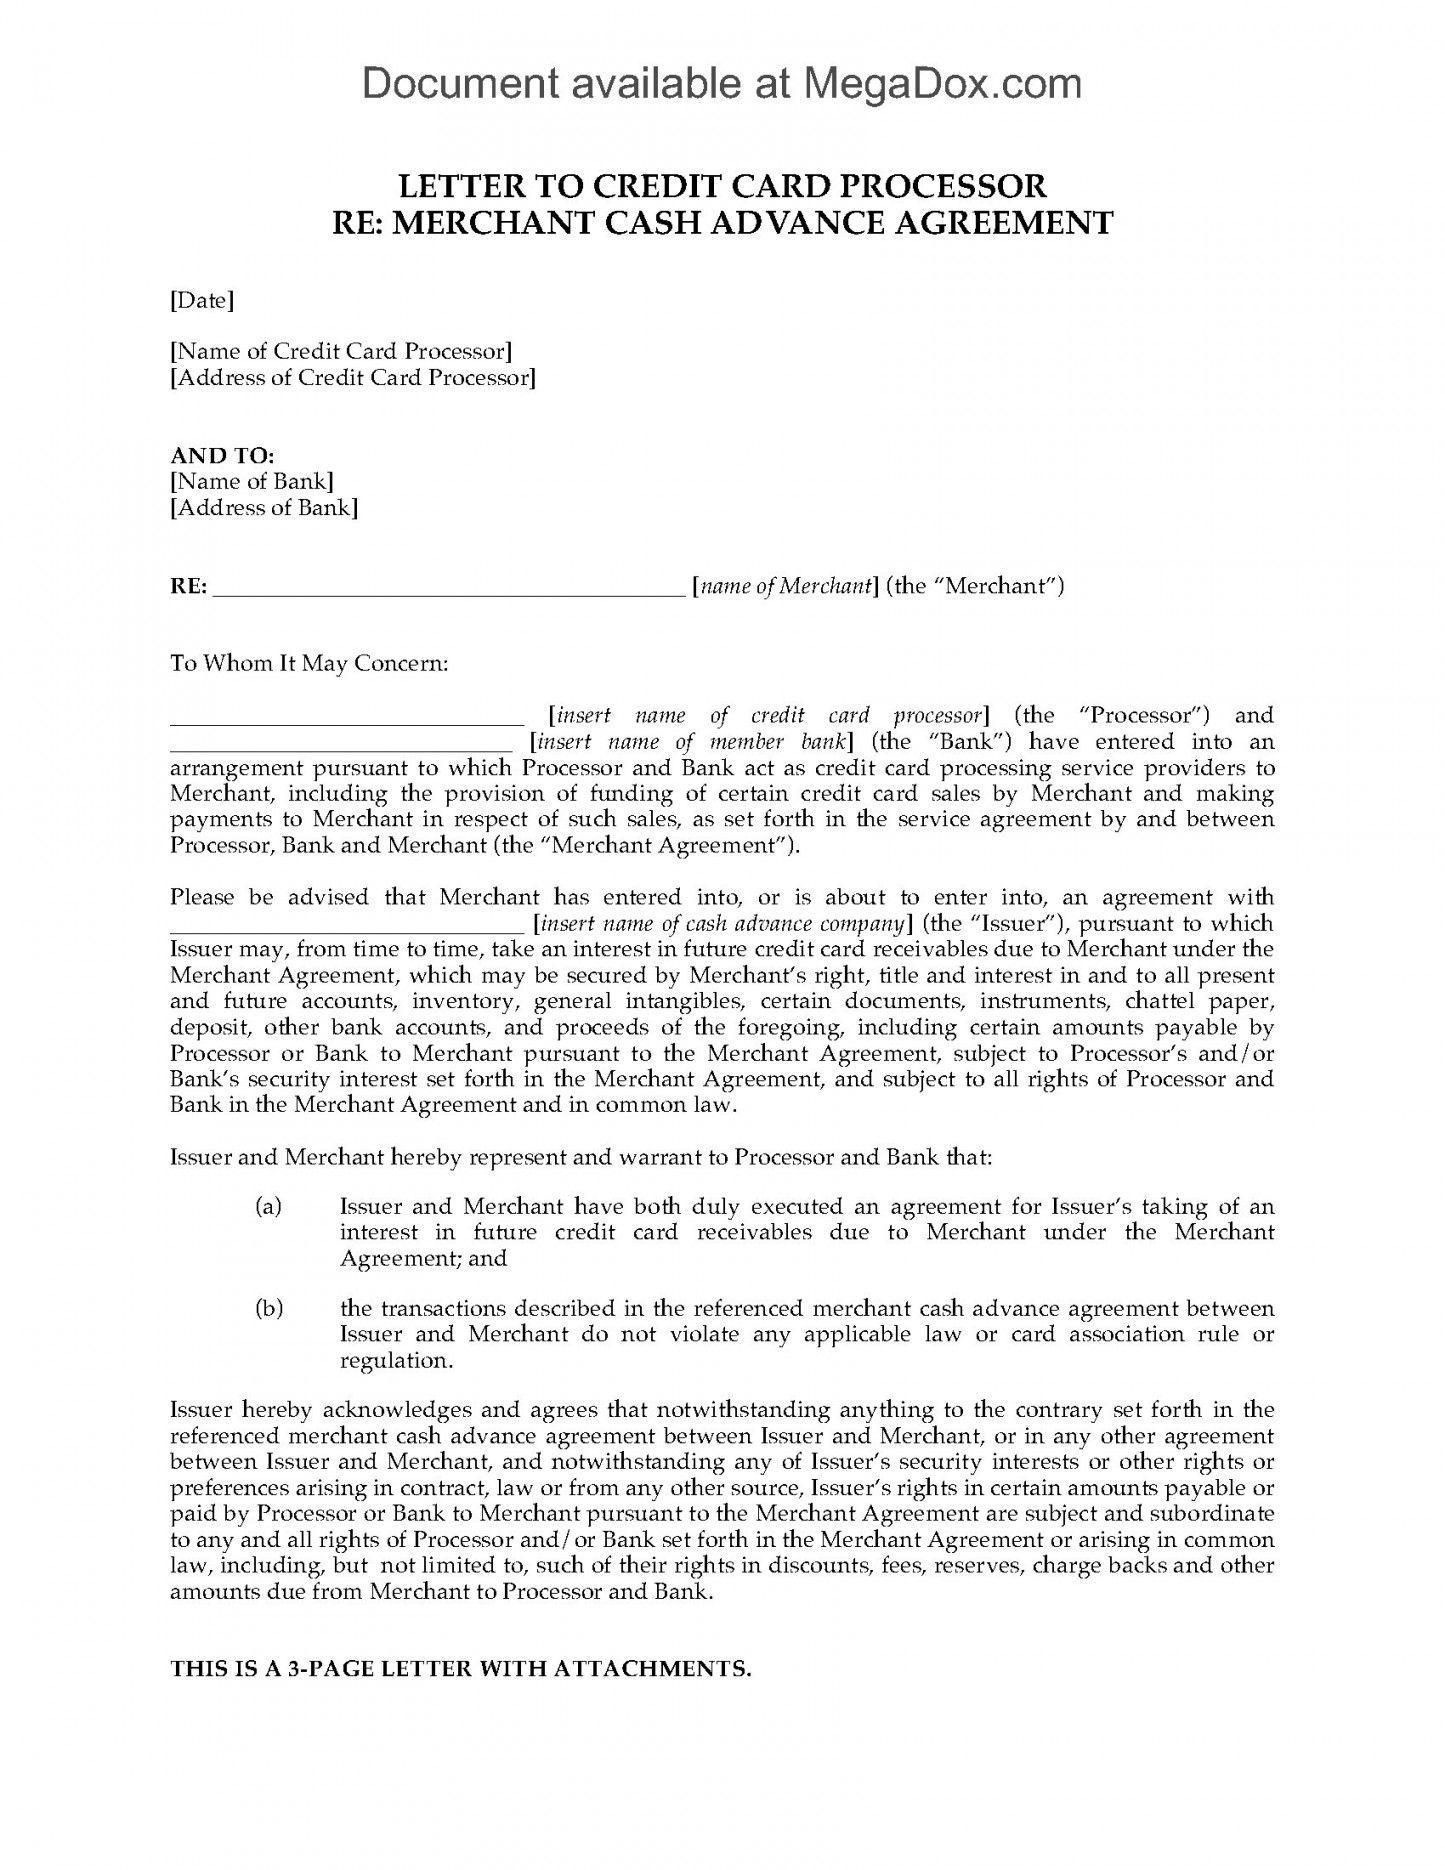 Cash Advance Agreement Template